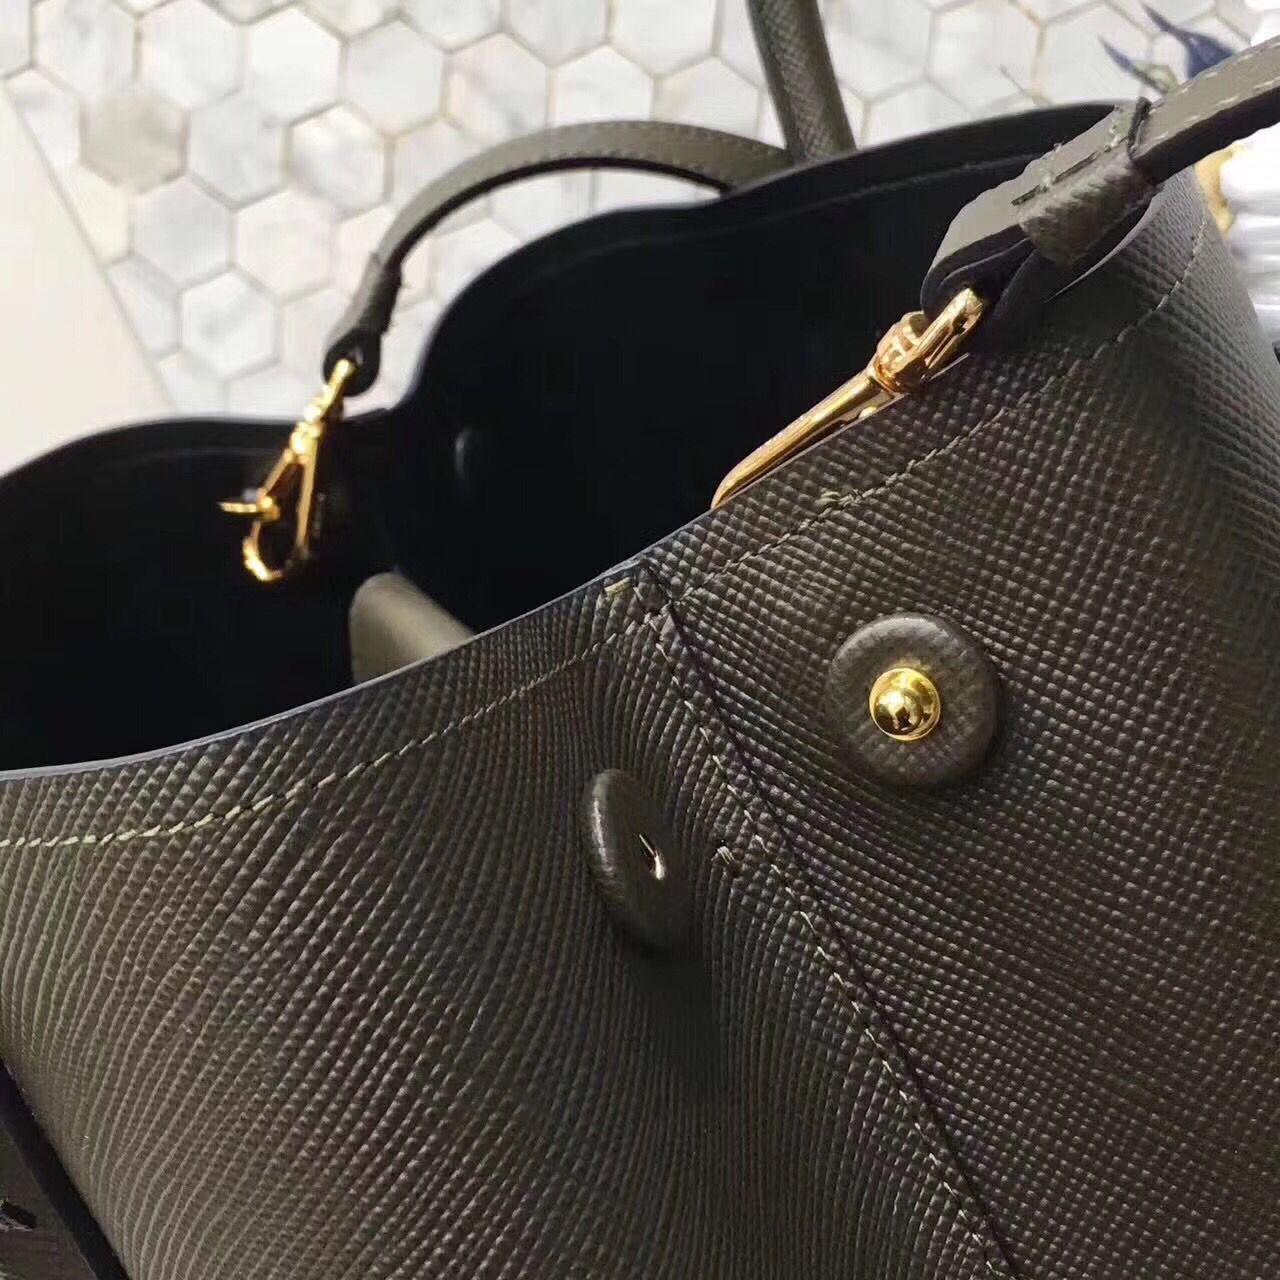 Prada Saffiano Cuir  Original Leather Tote Bag BN2758 Black